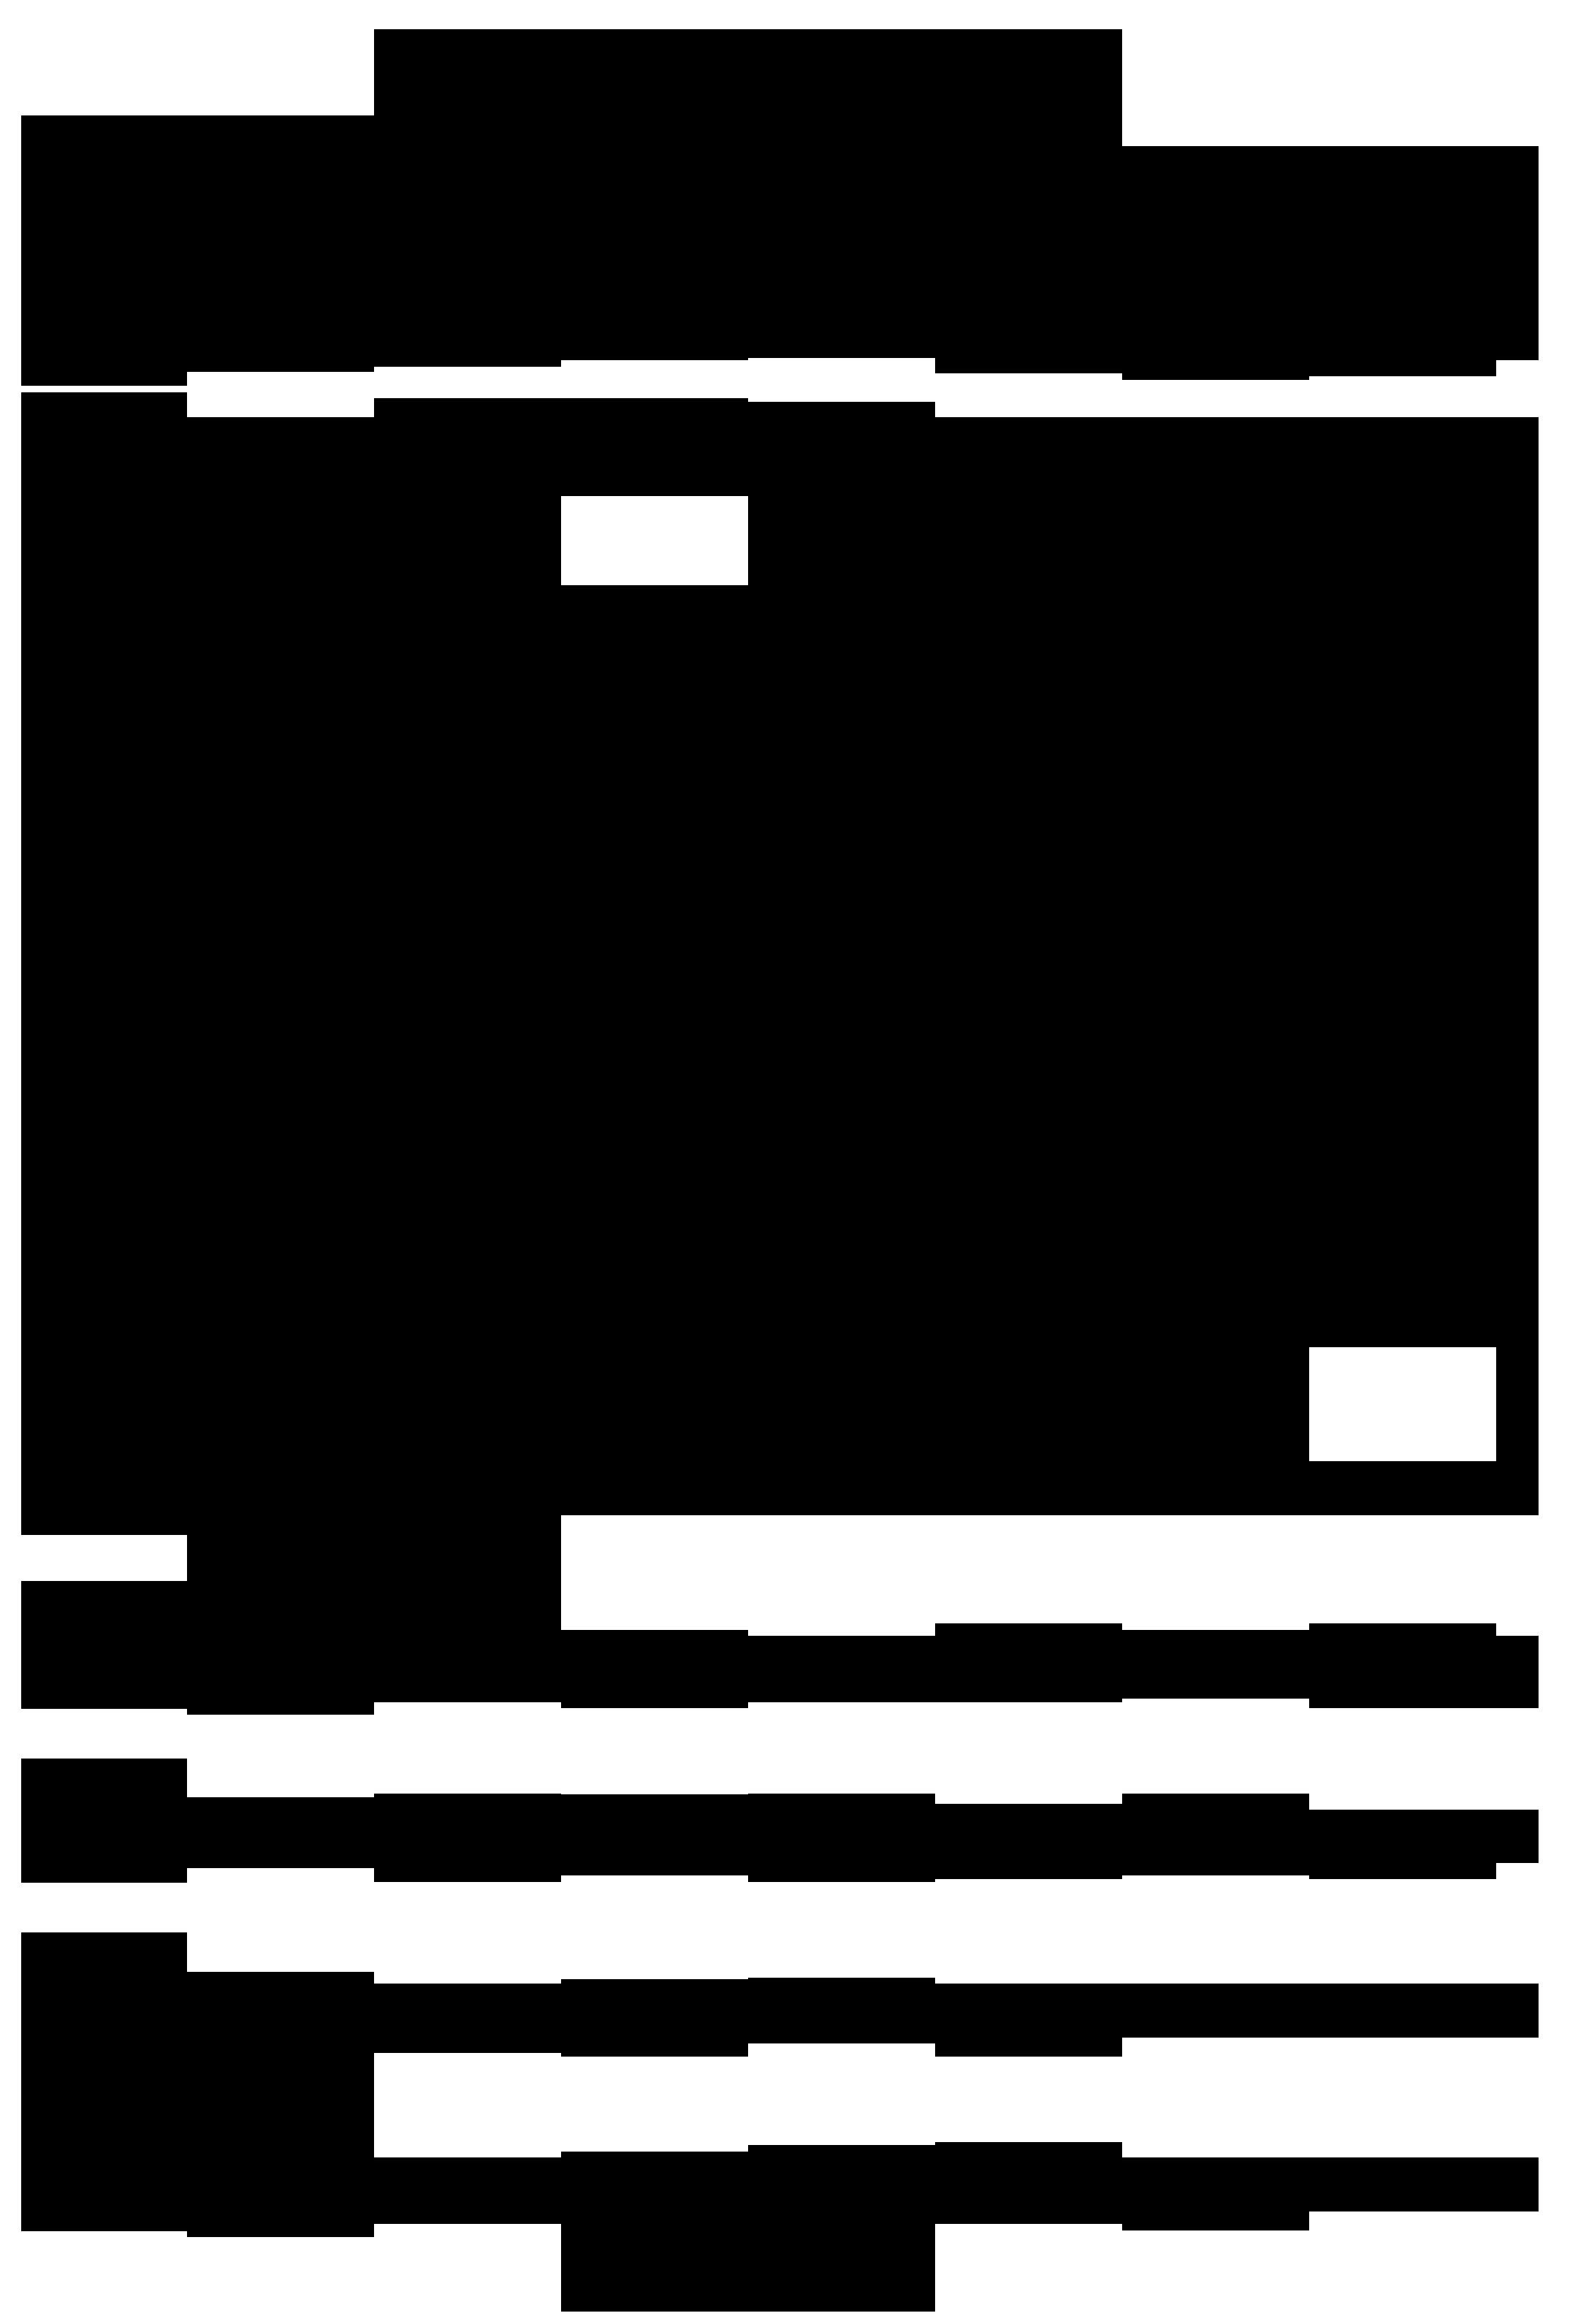 Enkla skalövningar 2 i B-dur